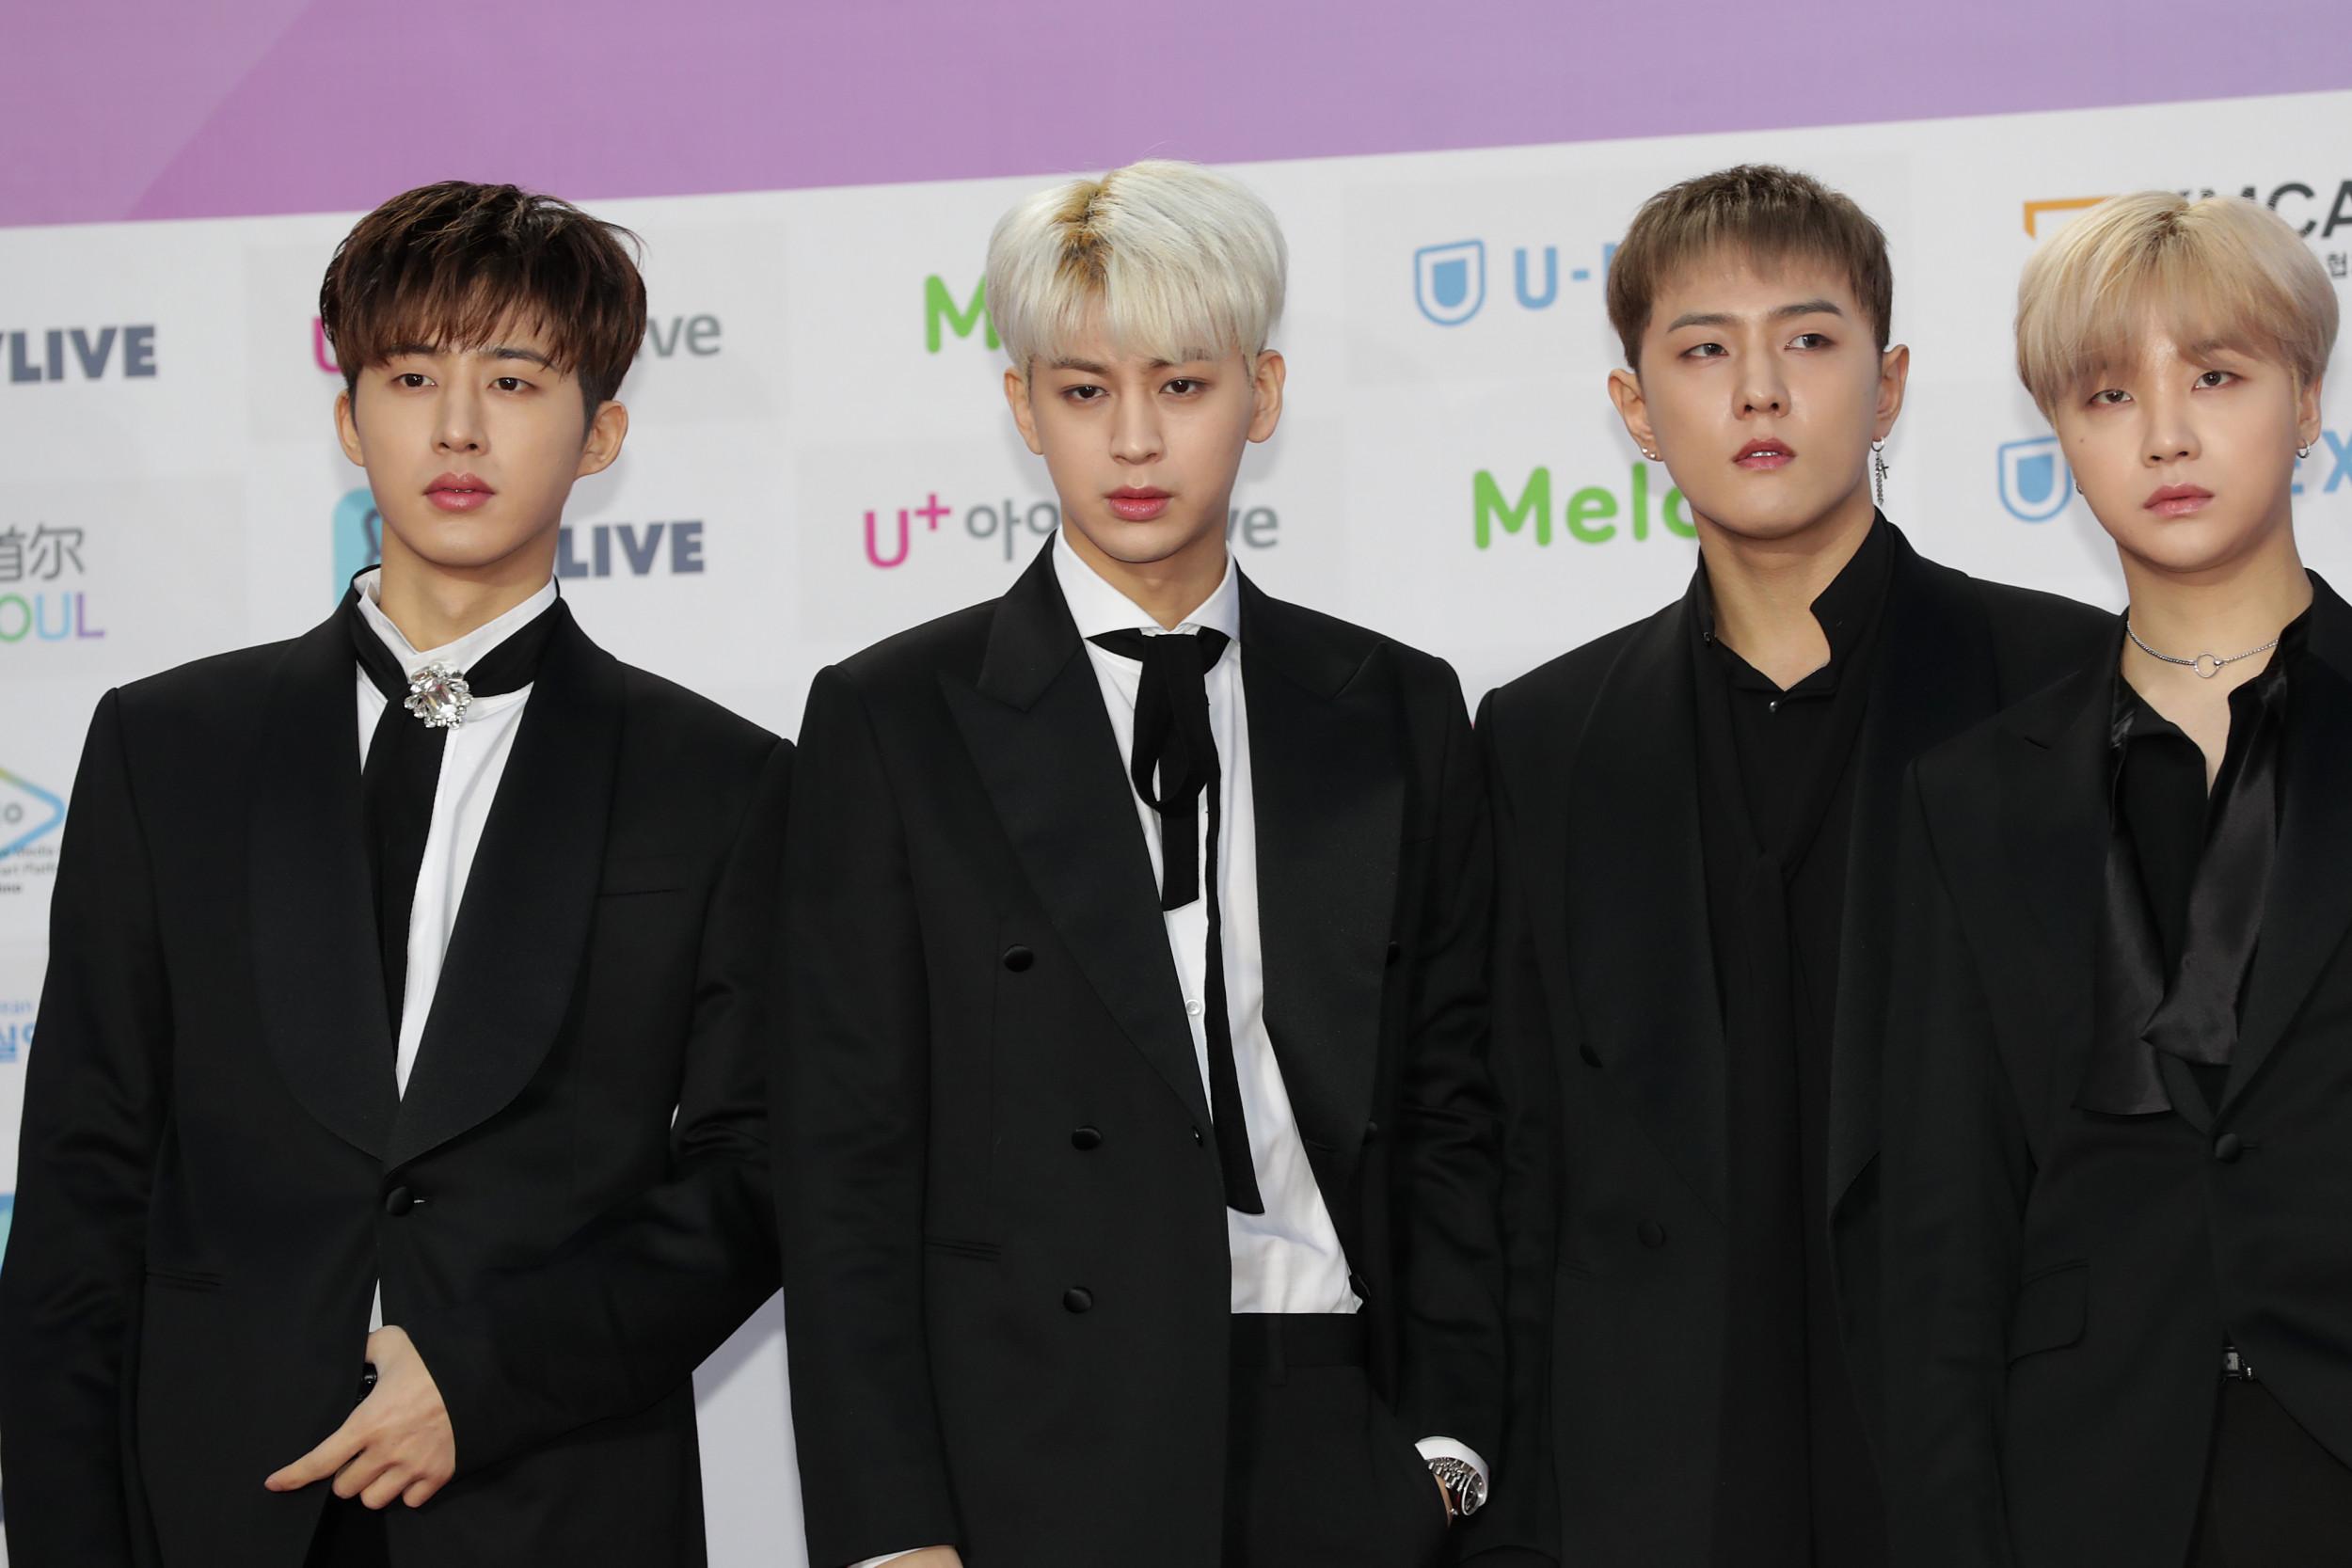 #HelloHanbinIsFree Trends As K-pop Artist and Former iKon ...